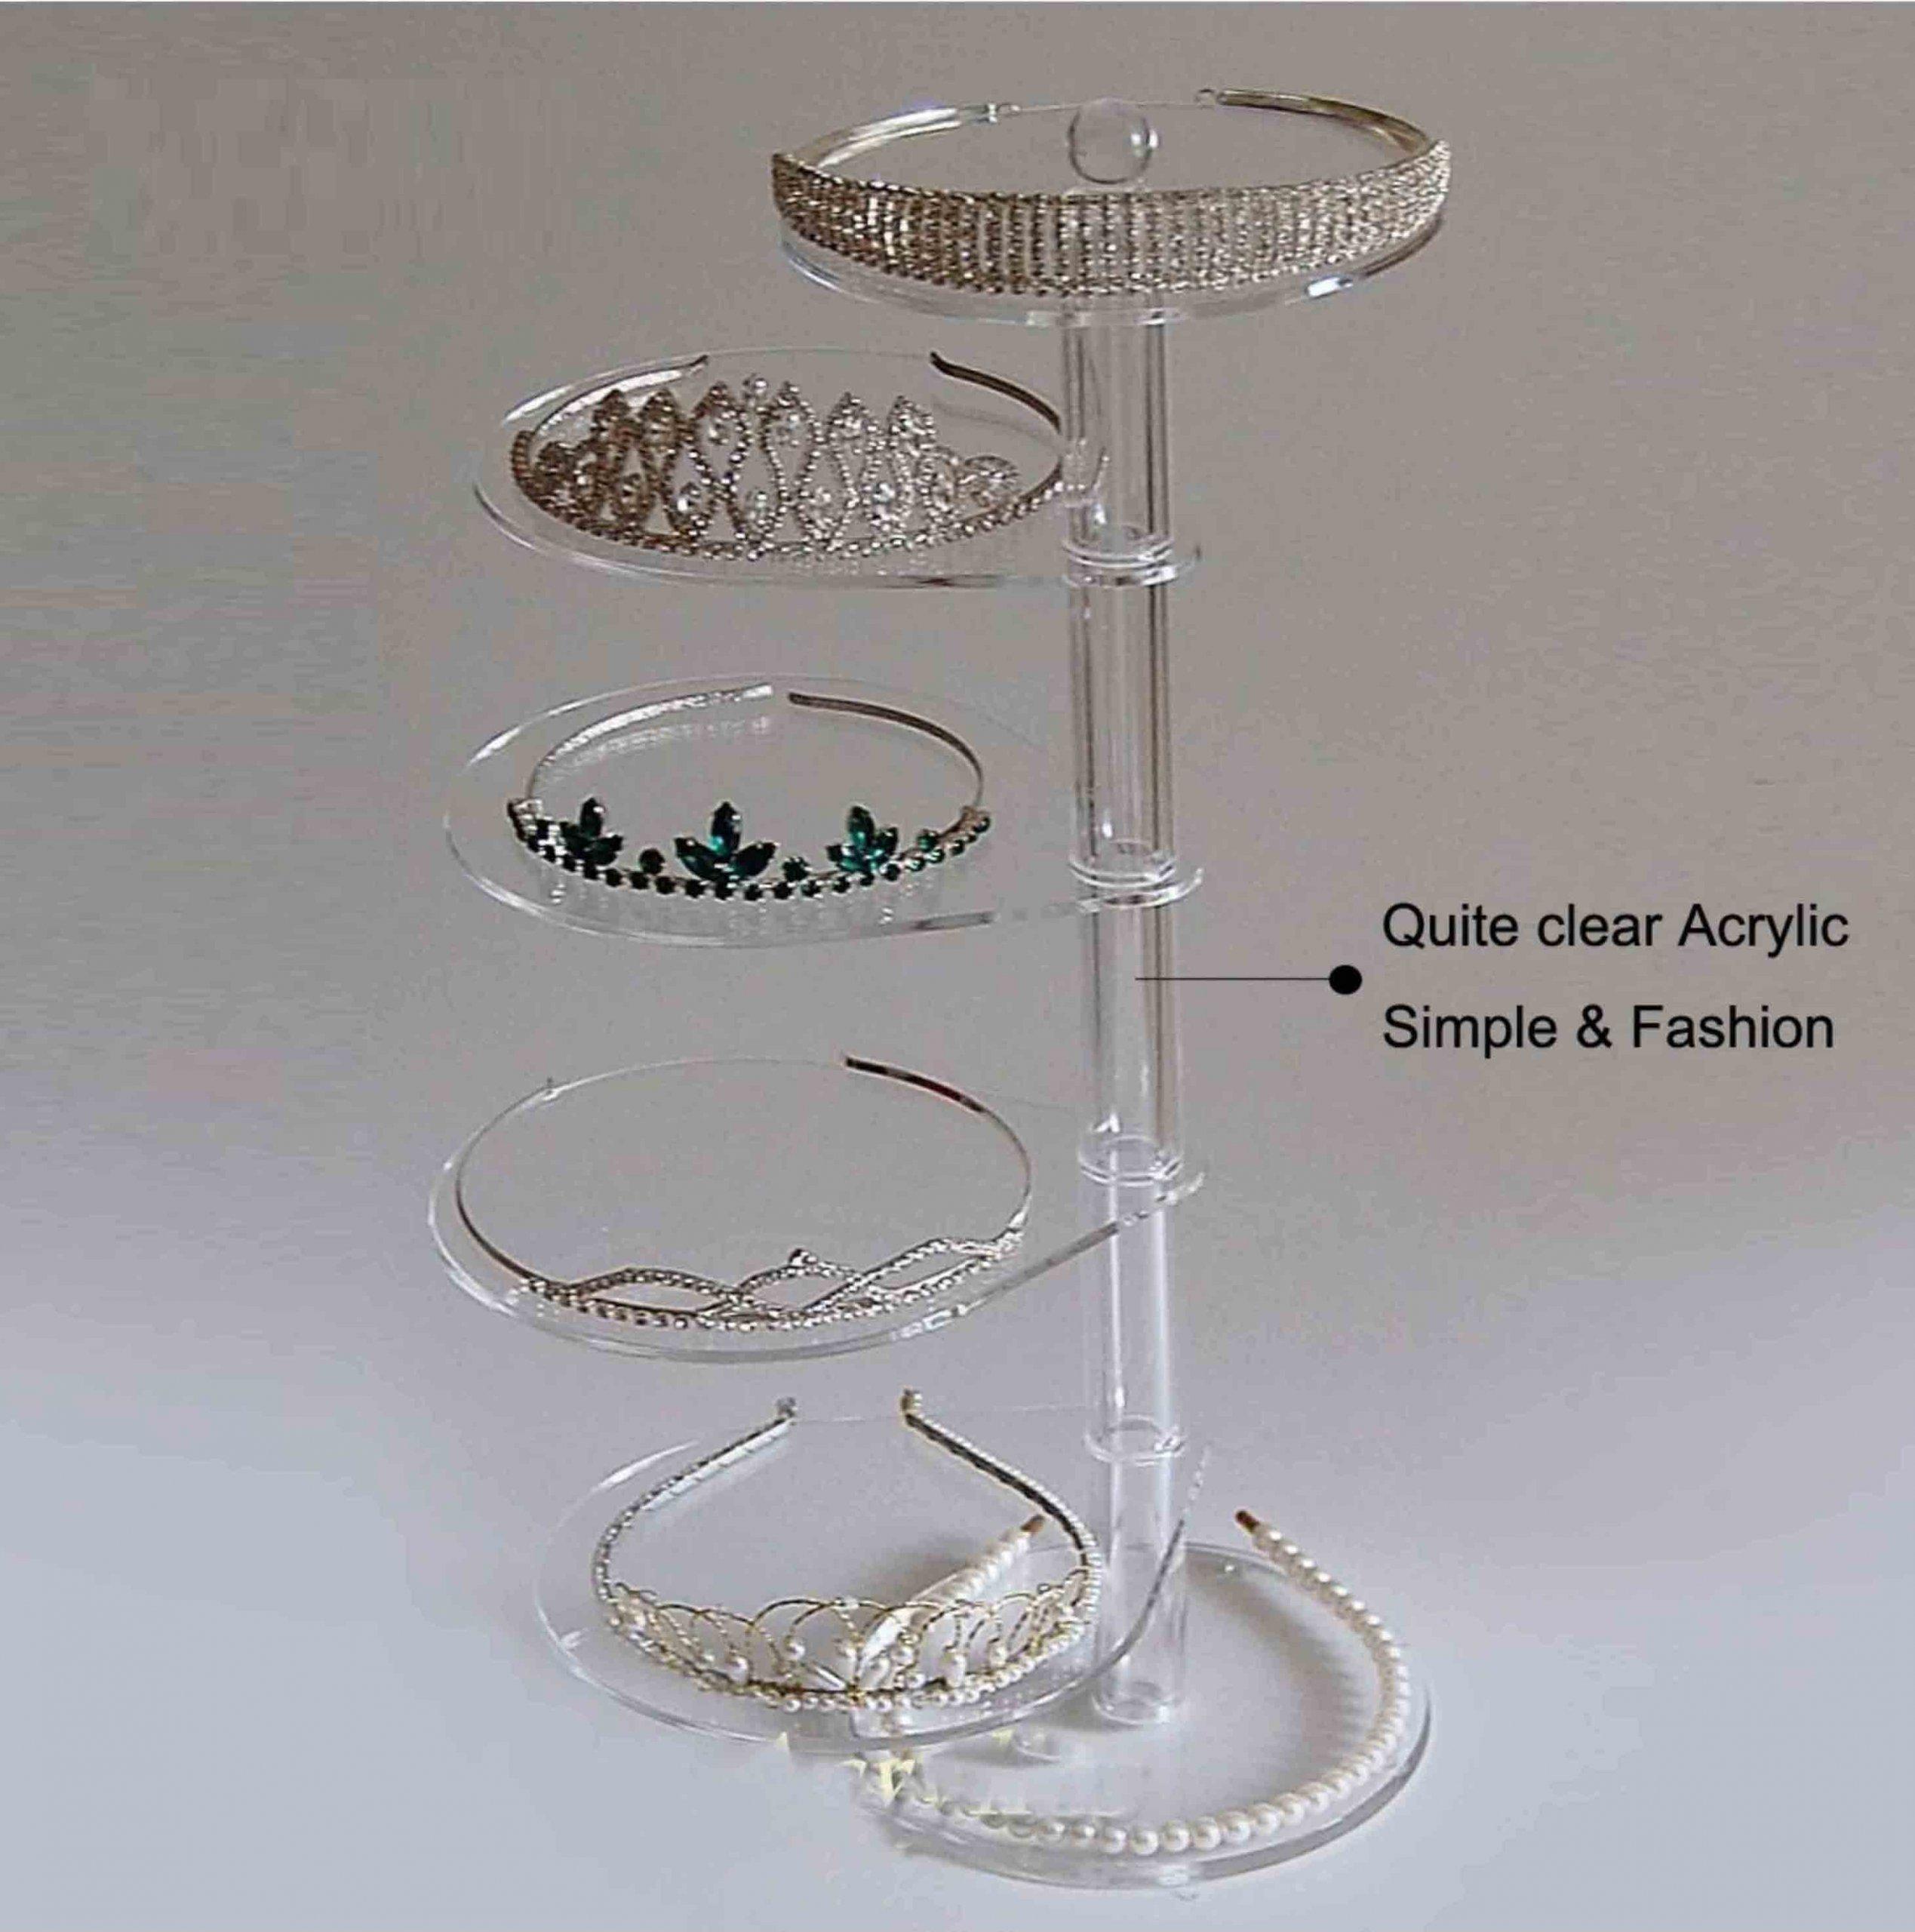 Revolving Acrylic Jewelry Display Table Kits rotating necklace display